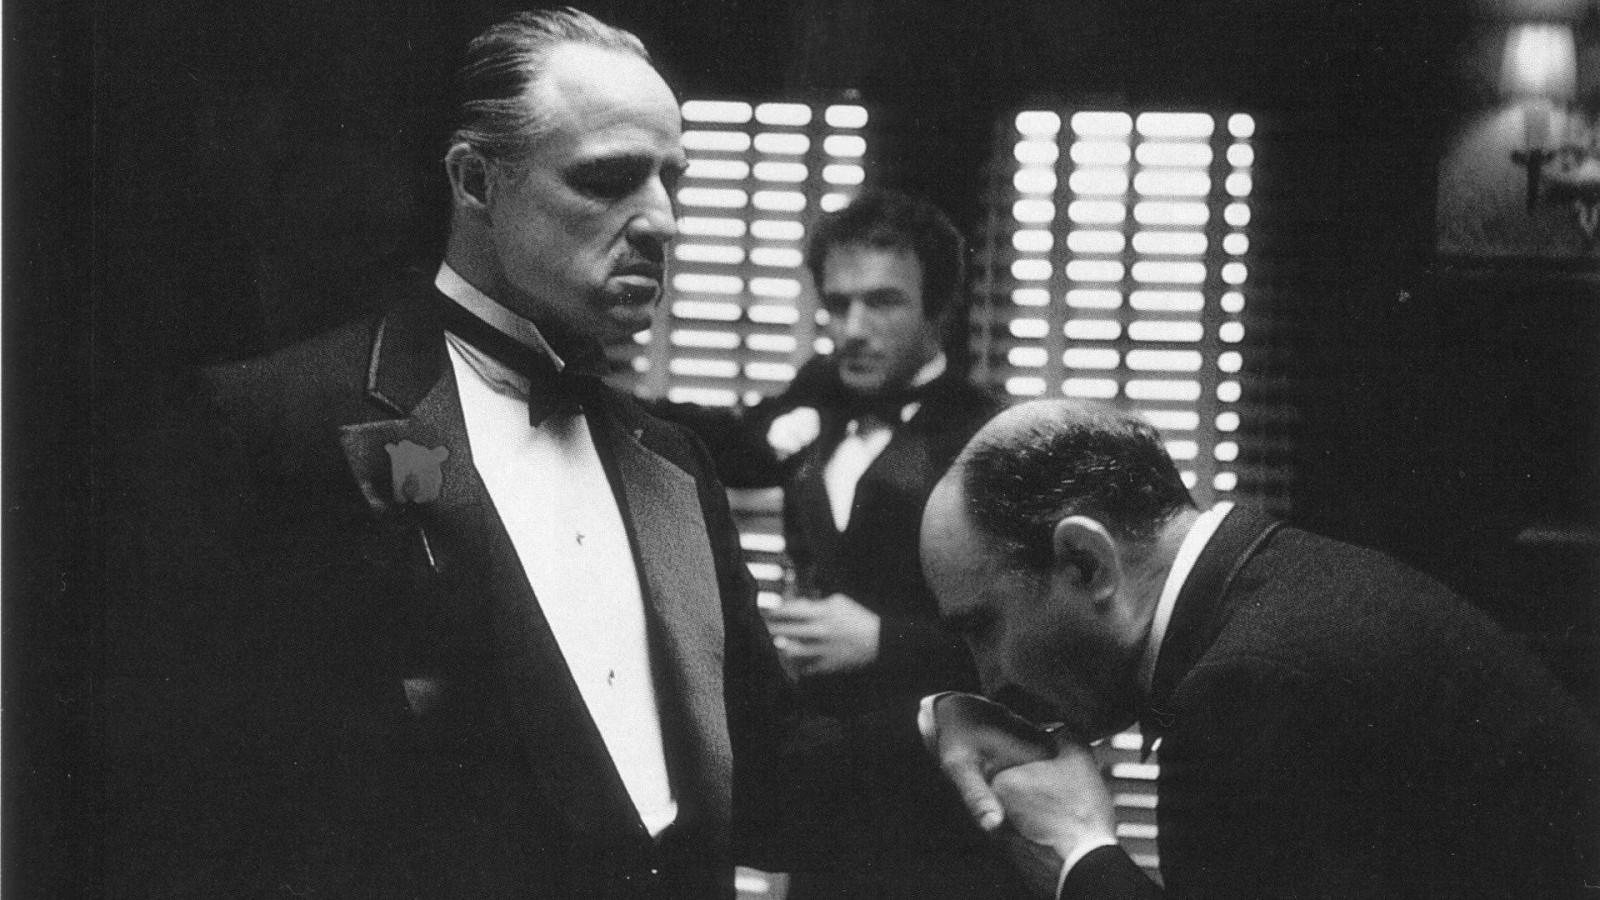 Wallpaper 1920x1080 Px Film Stills Mafia Marlon Brando